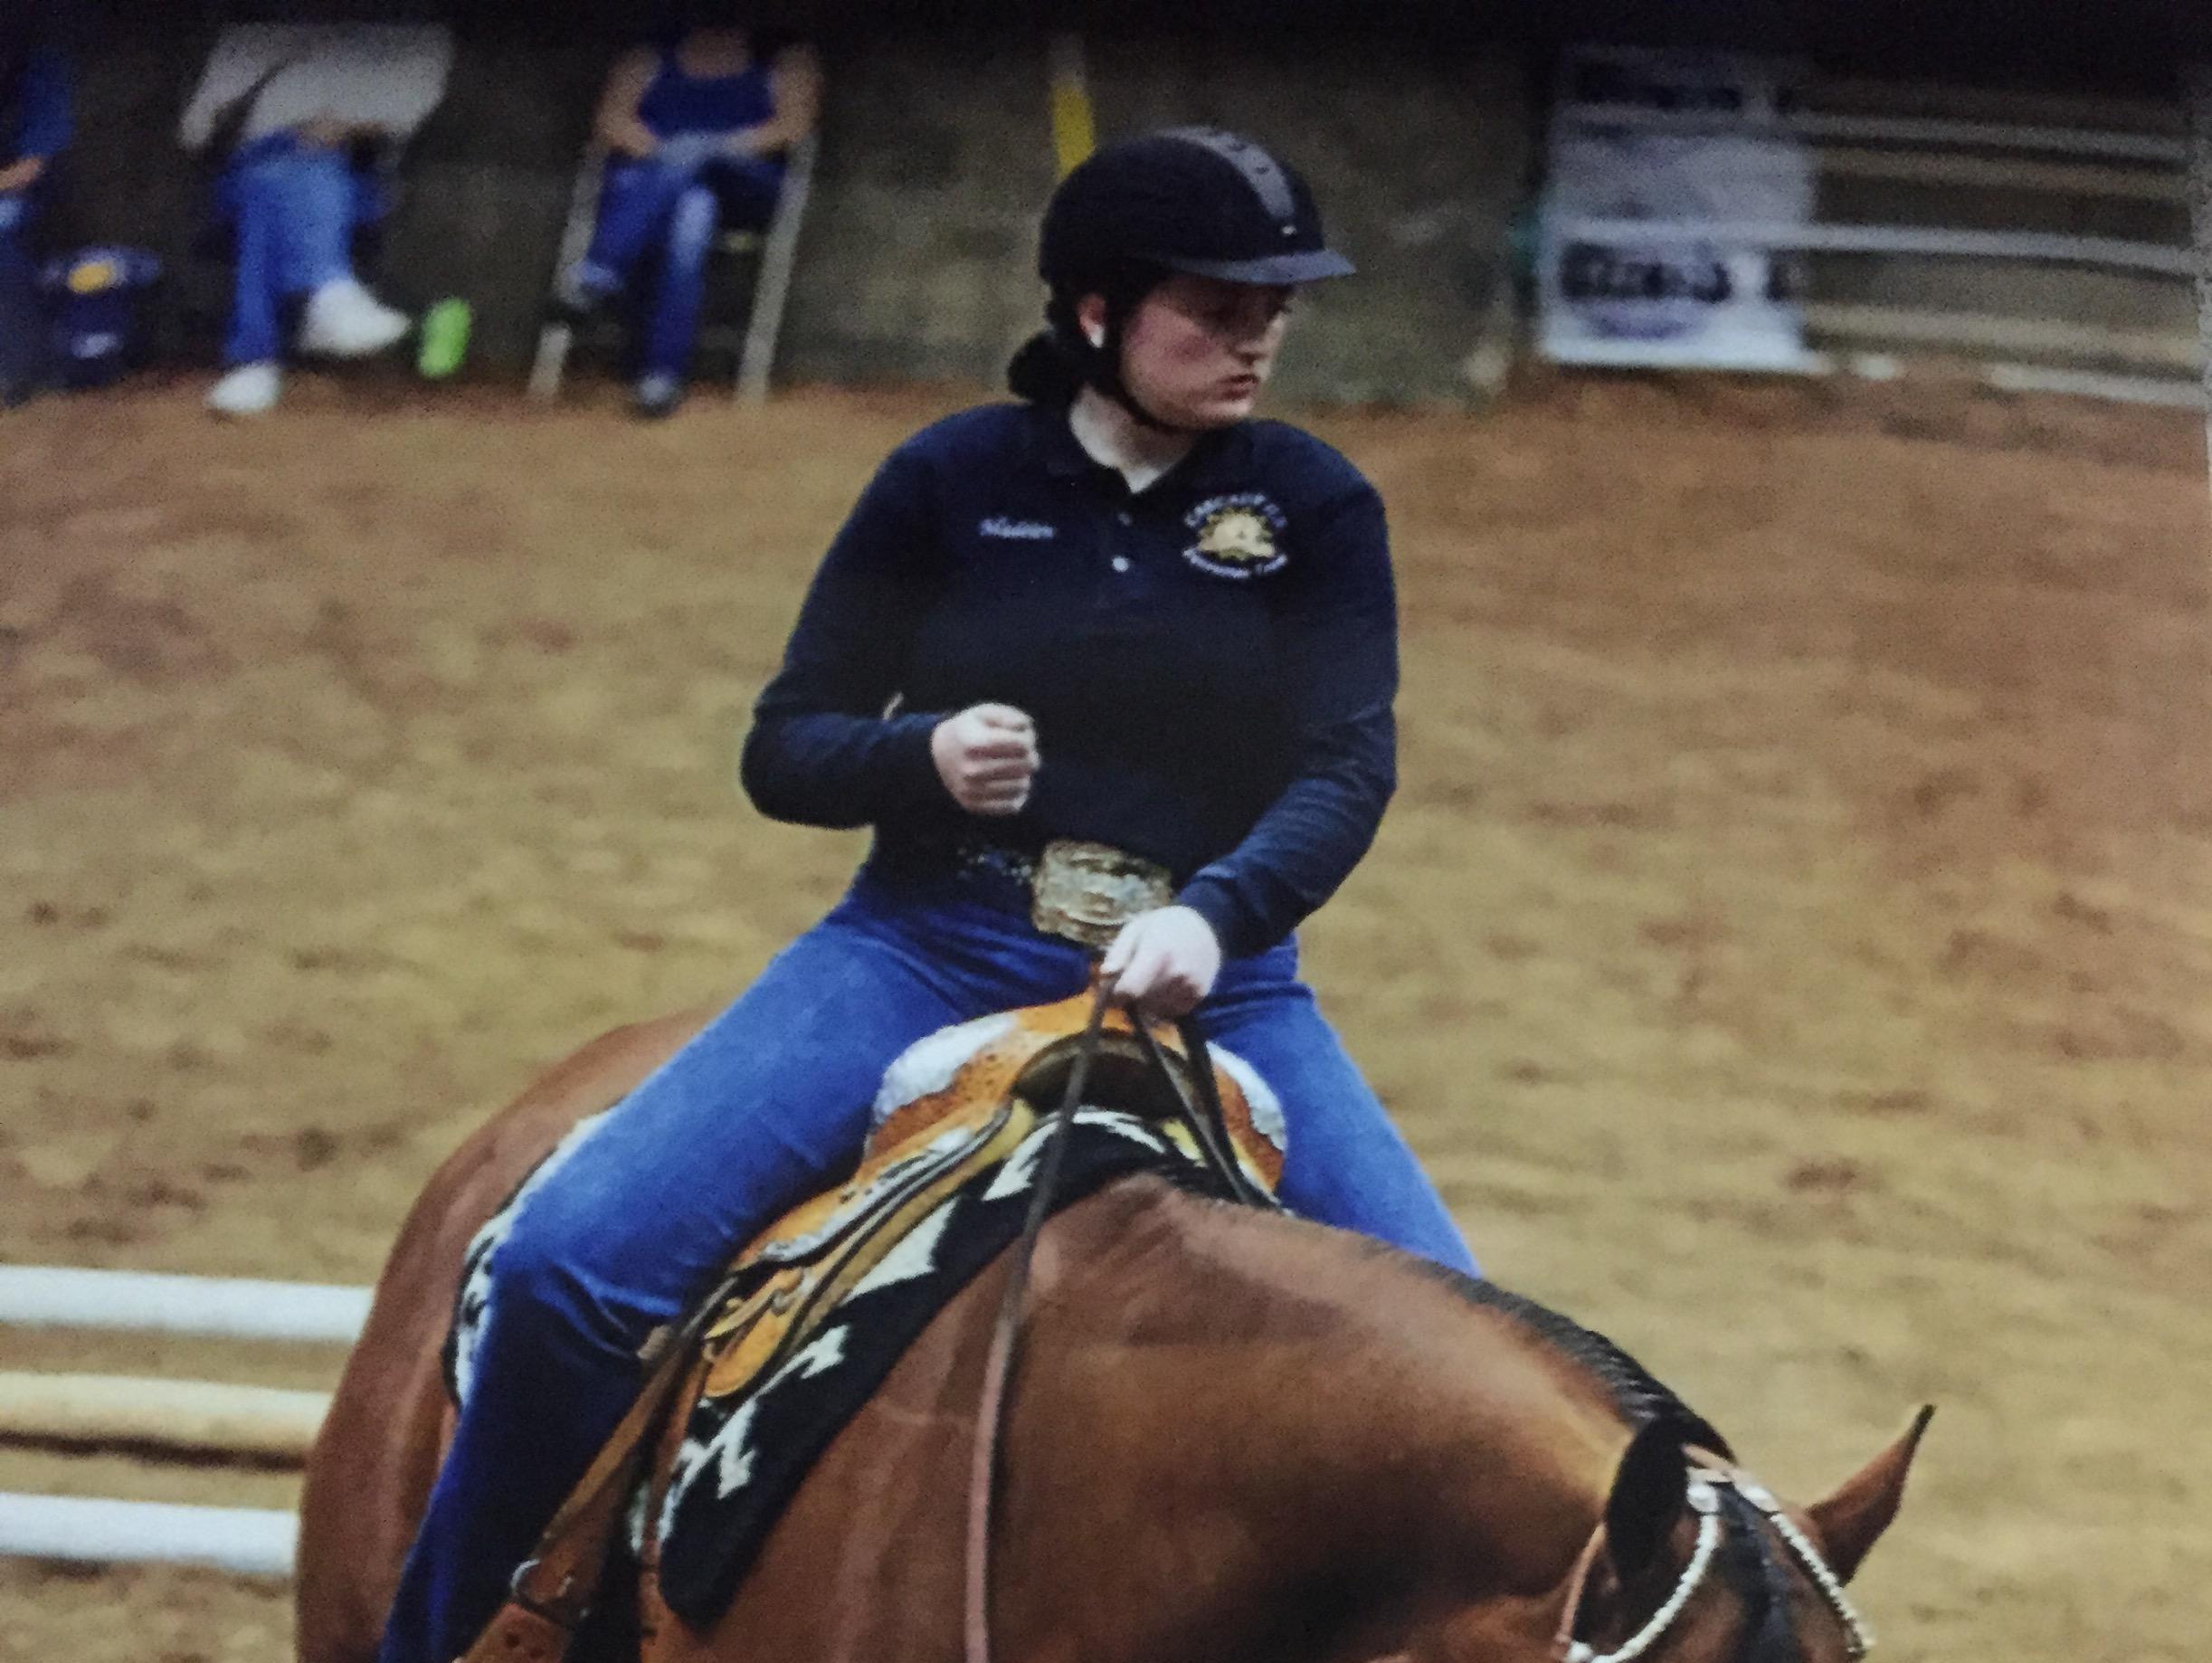 Cascade's Madelen Dewar competes at the OHSET State Championship Meet.